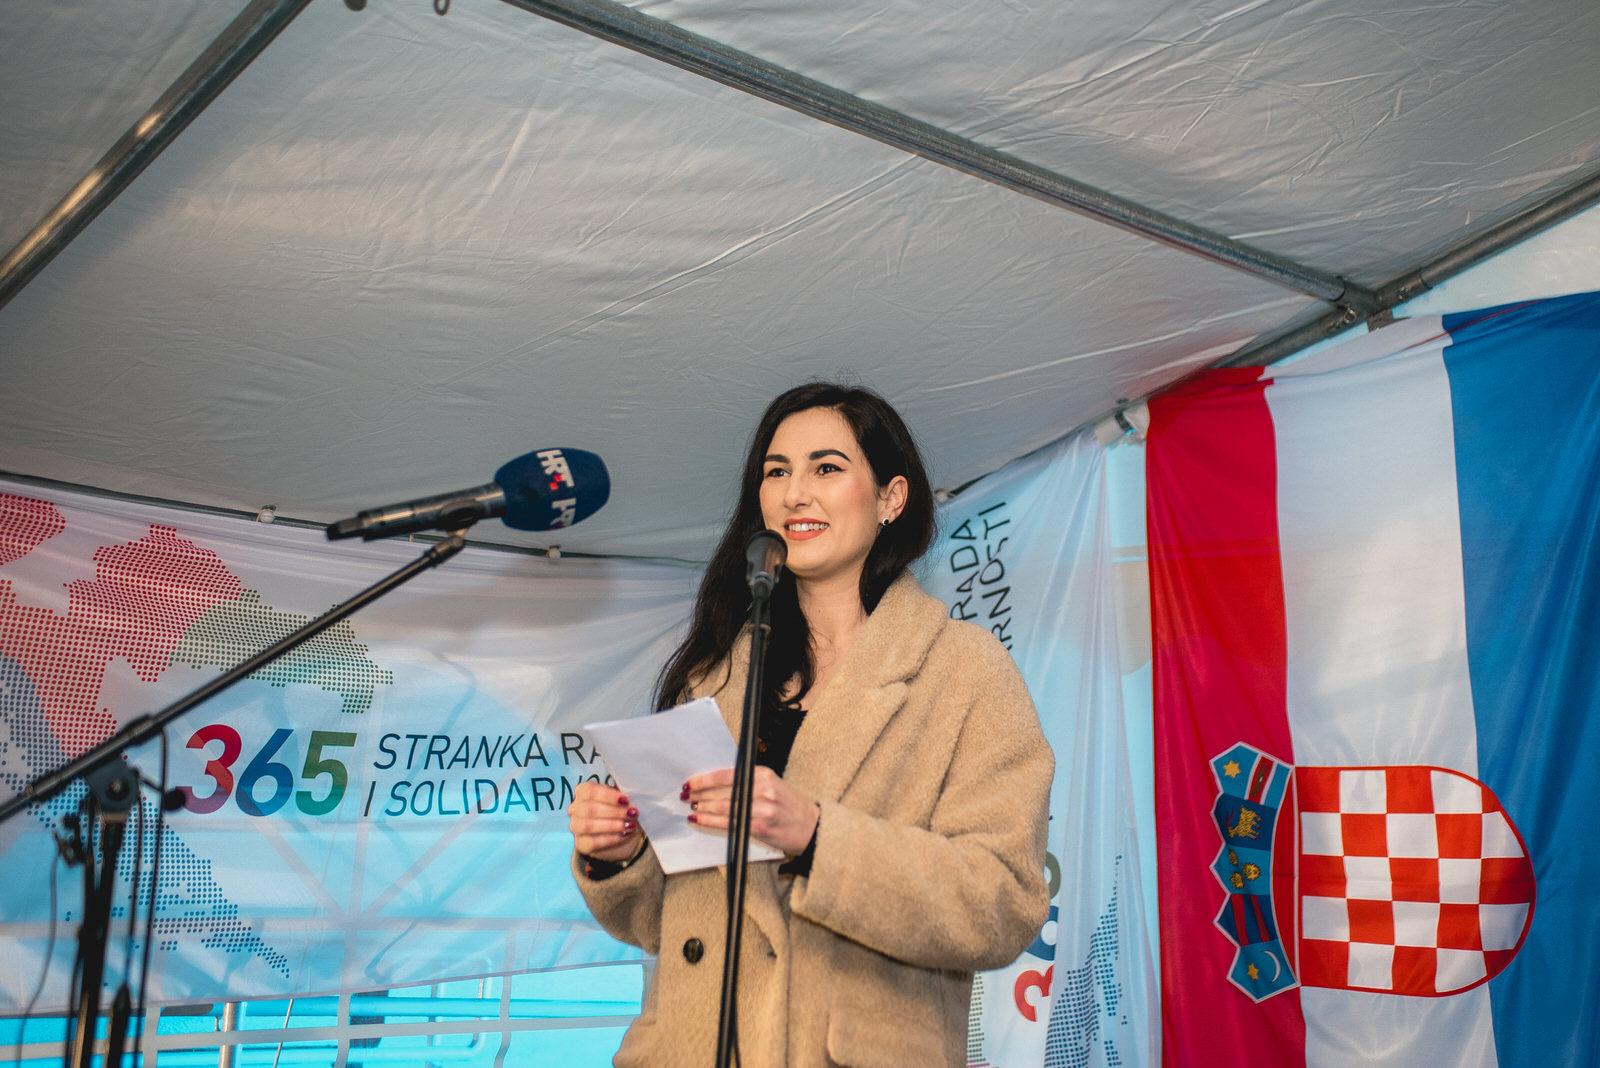 likaclub_milan-bandić-lički-osik_2019-25